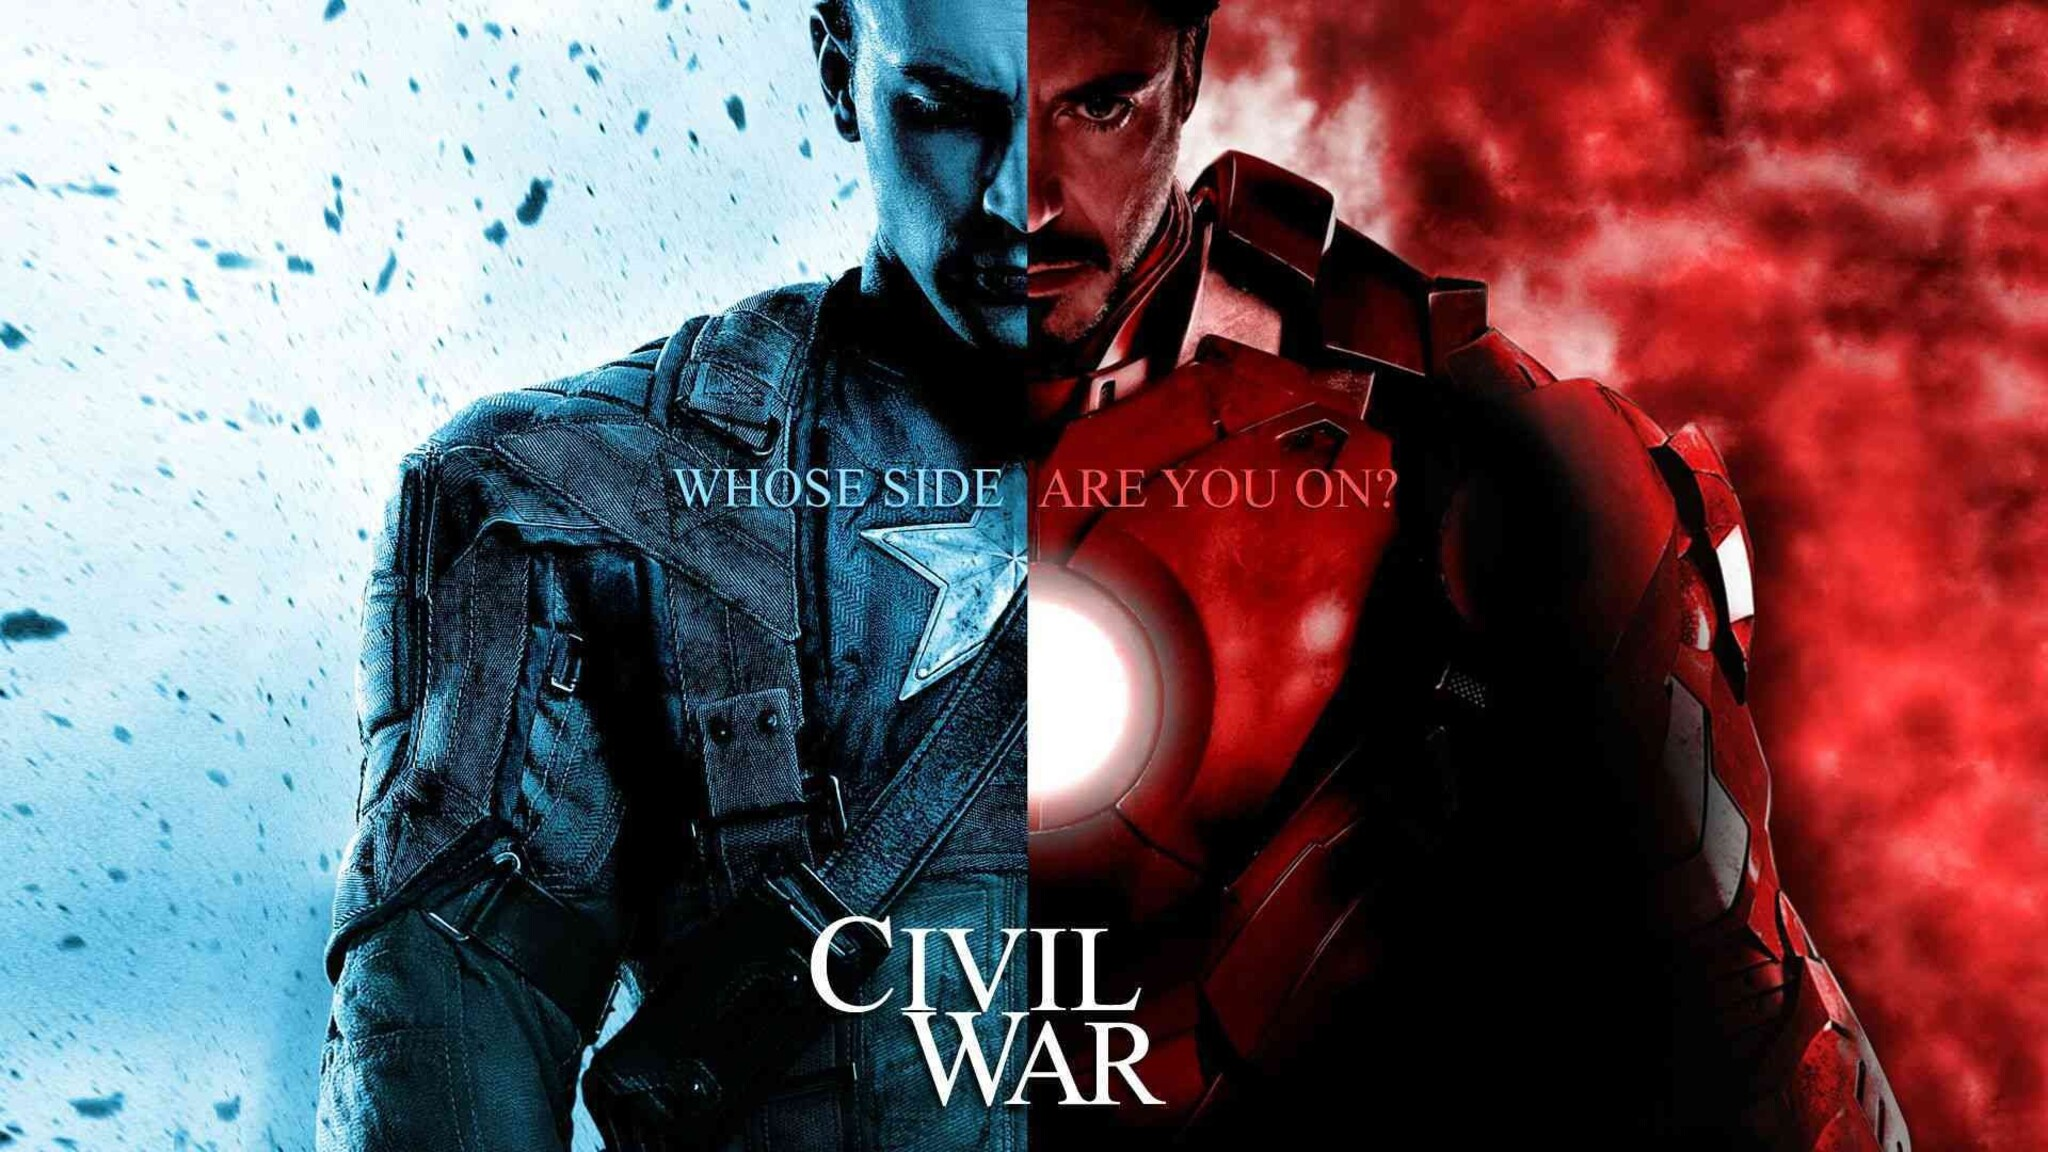 2048x1152 captain america vs iron man 2048x1152 resolution hd 4k